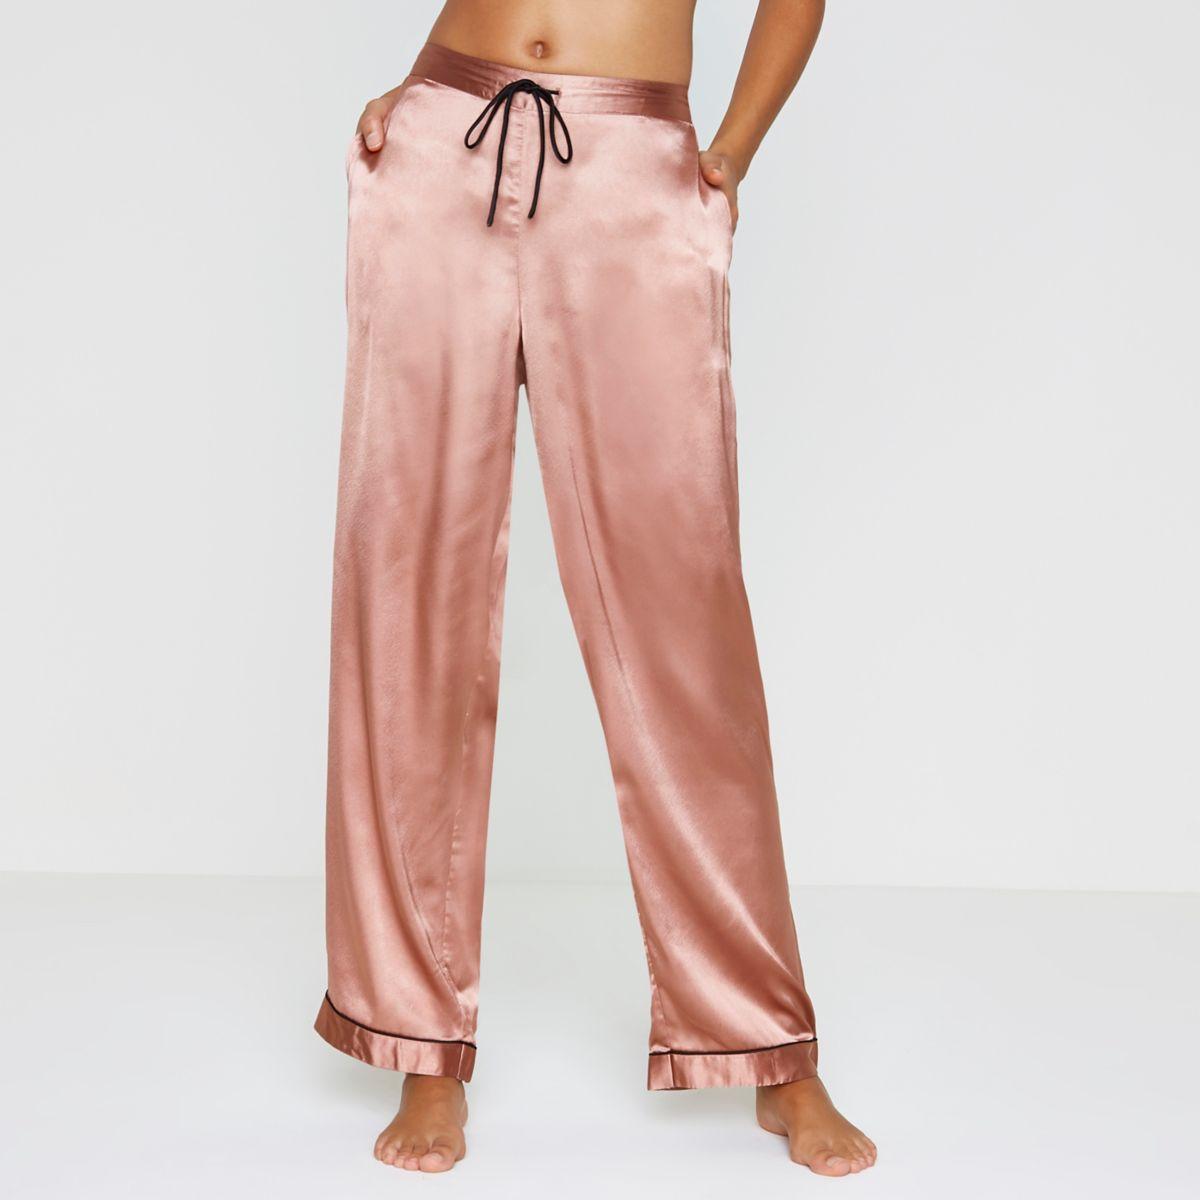 Pink satin pajama bottoms